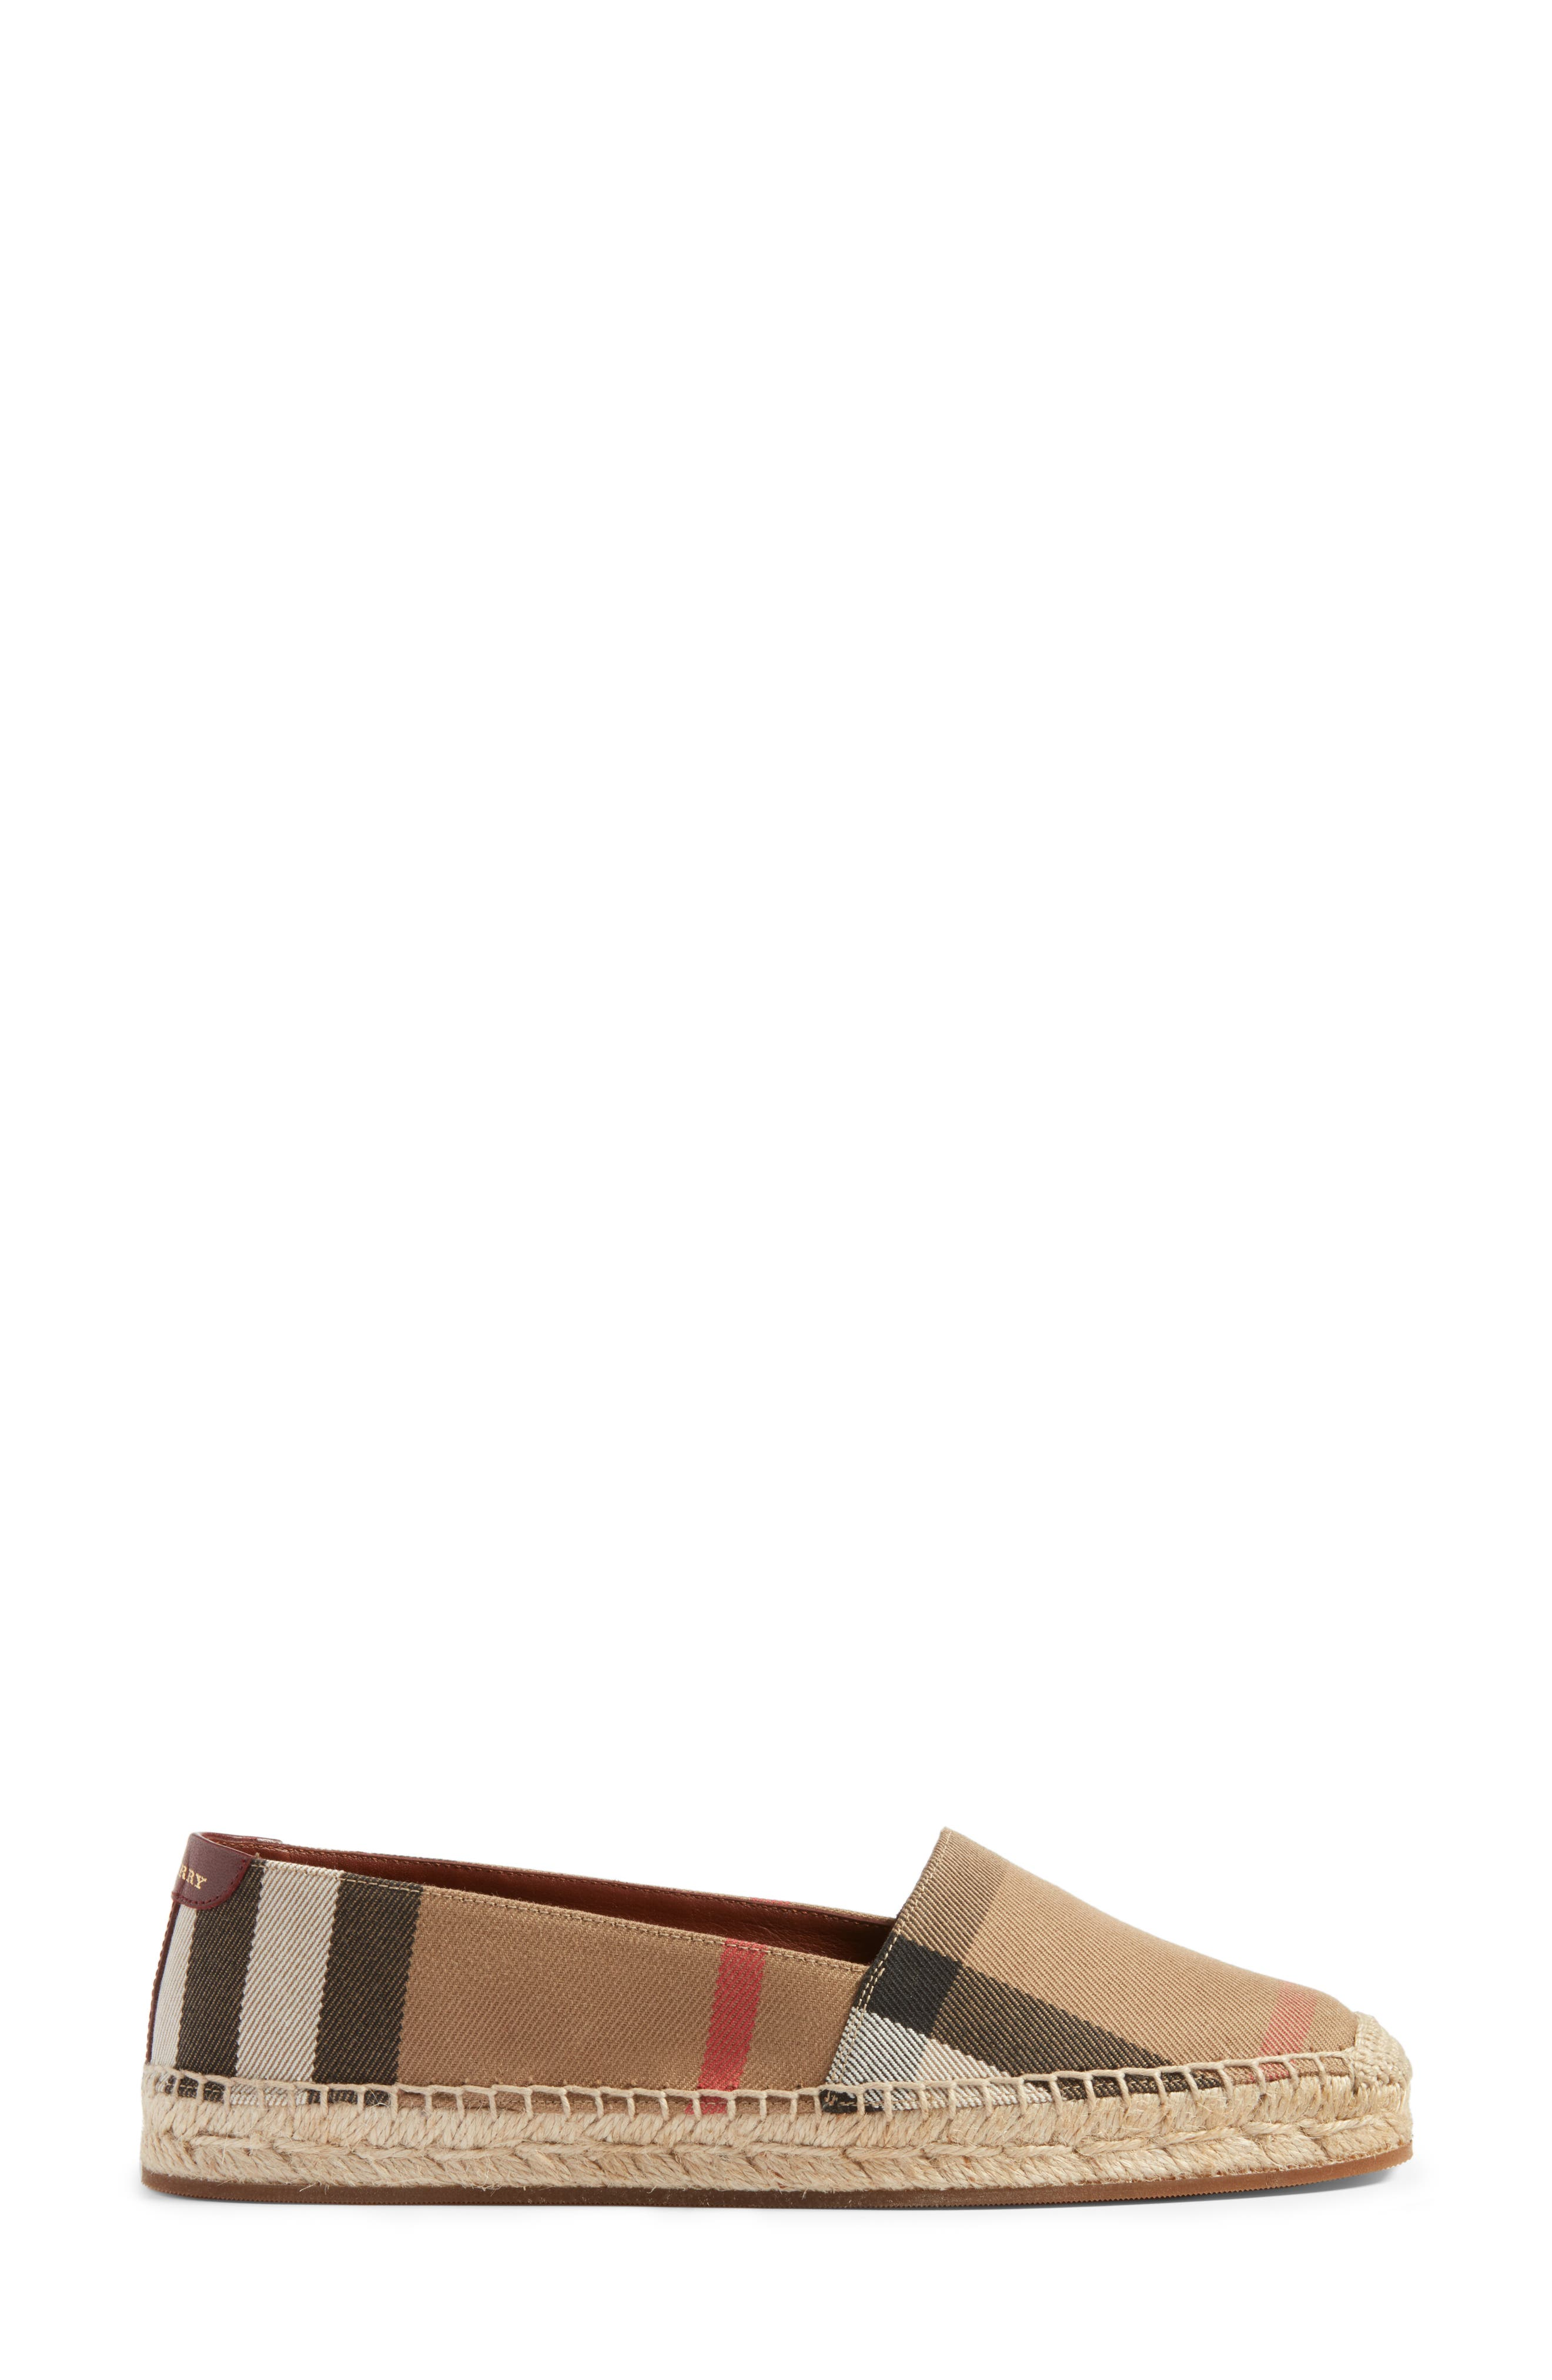 Alternate Image 3  - Burberry Check Print Espadrille Flat (Women)